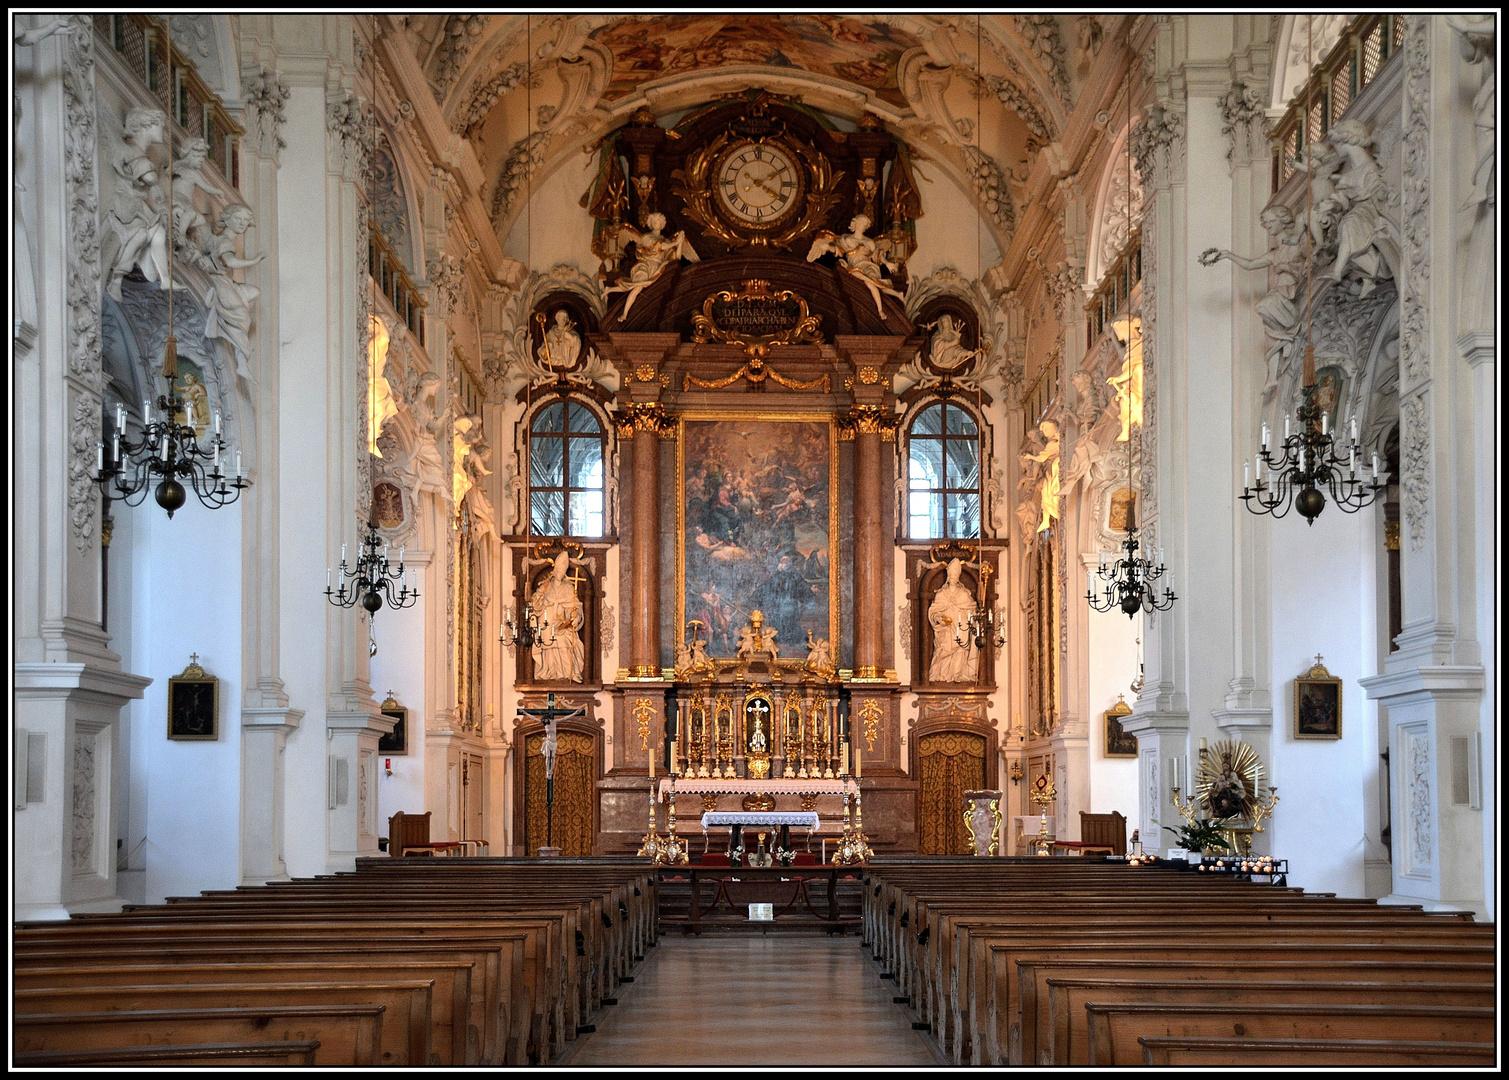 Pfarrkirche St. Benedikt, Benediktbeuern (02)